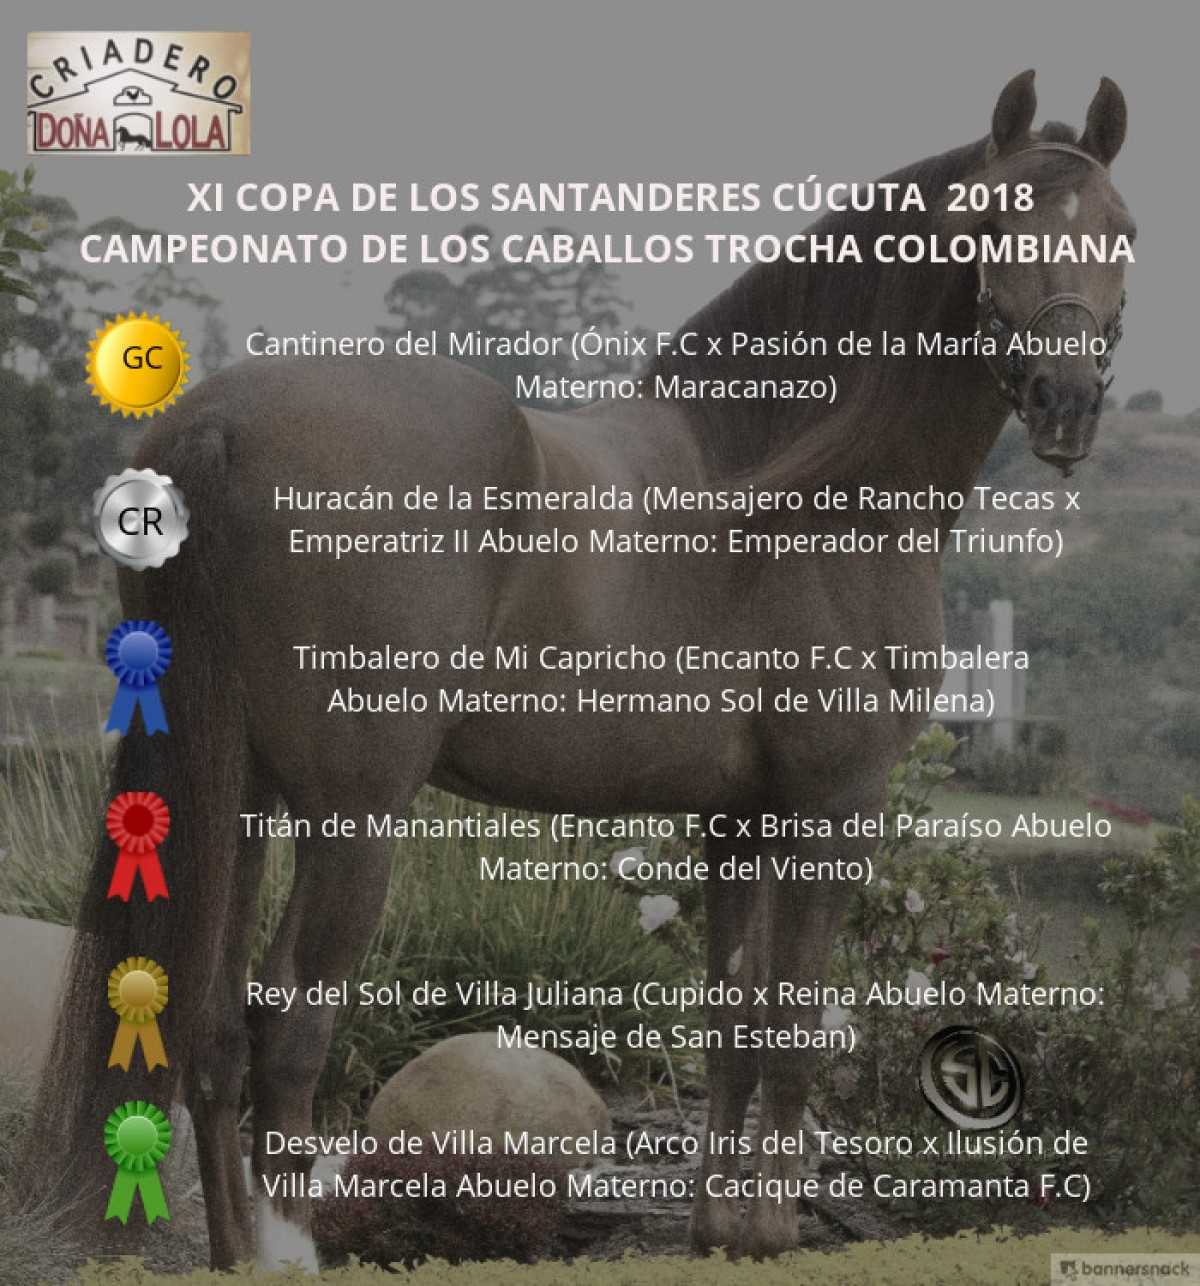 VÍDEO: Cantinero Campeón, Huracán Reservado, Trocha Colombiana - Cúcuta 2018